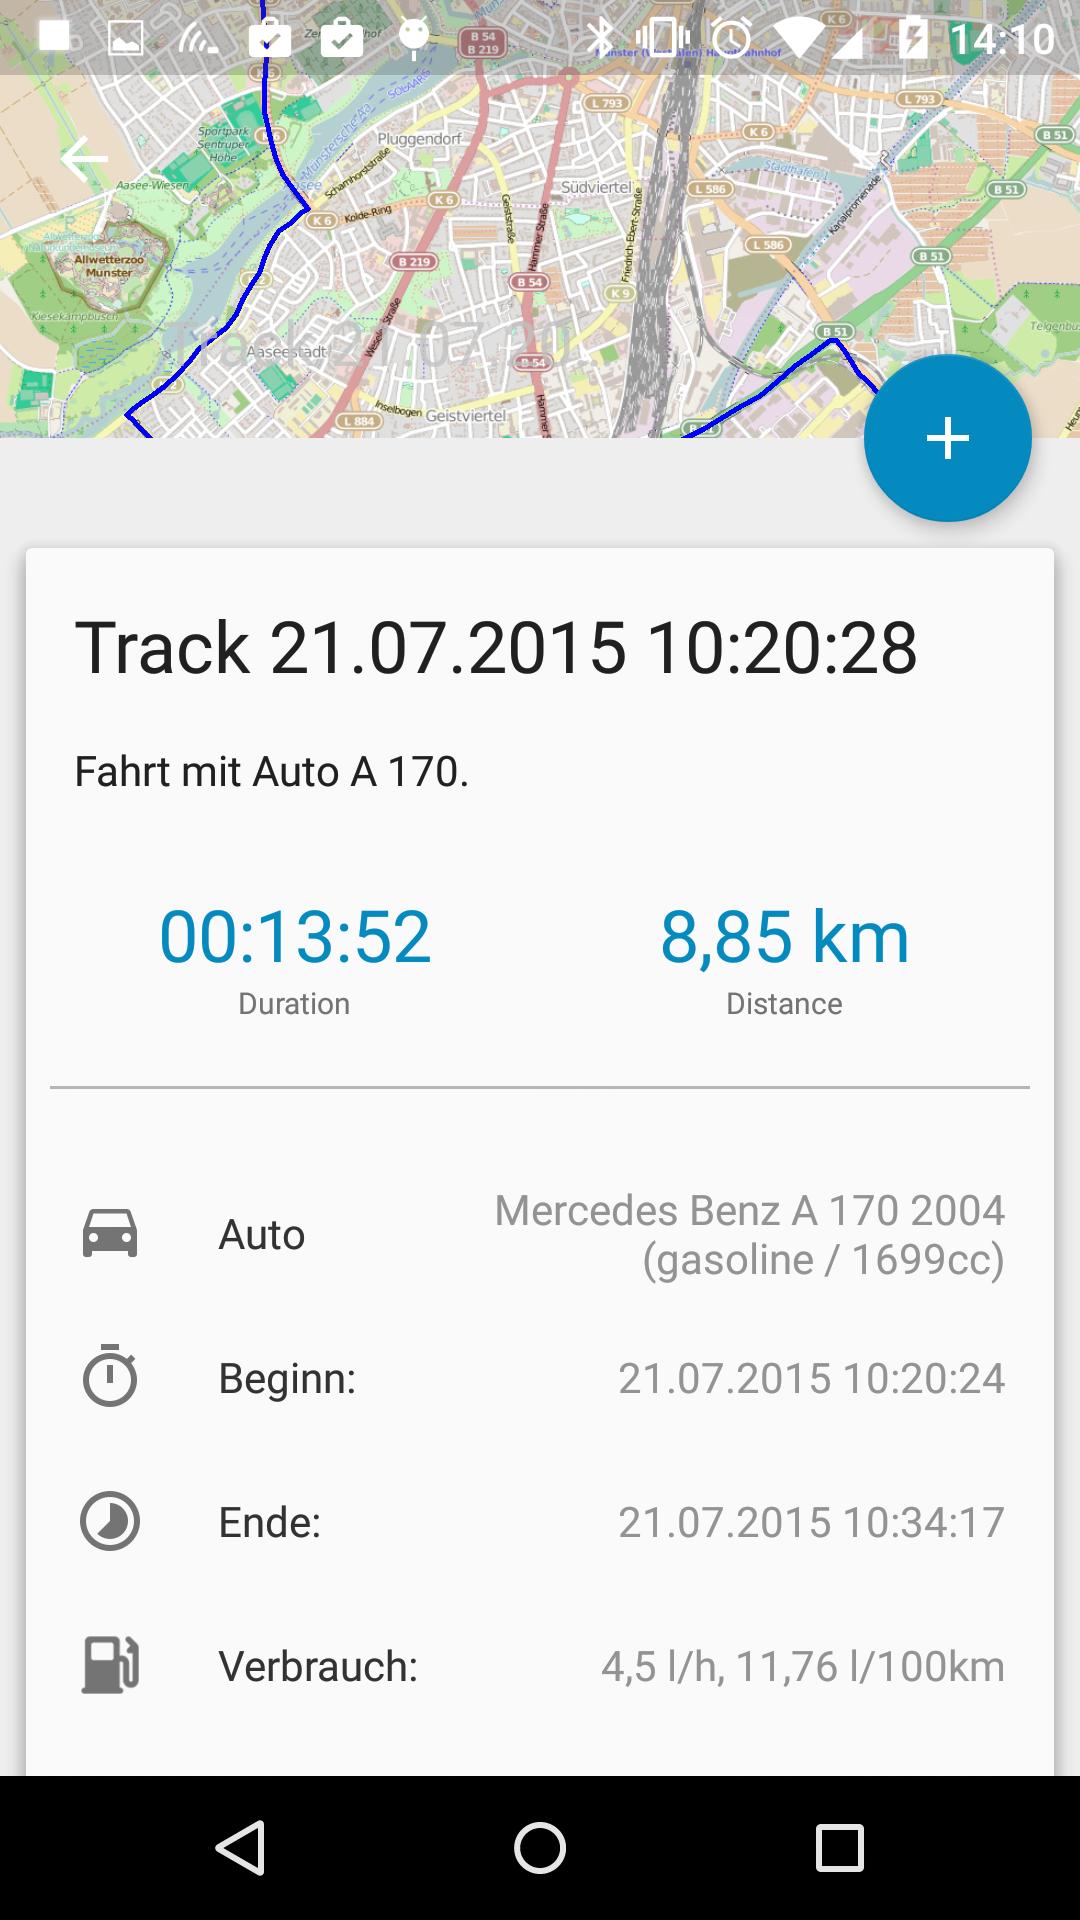 trackdetails_2.png